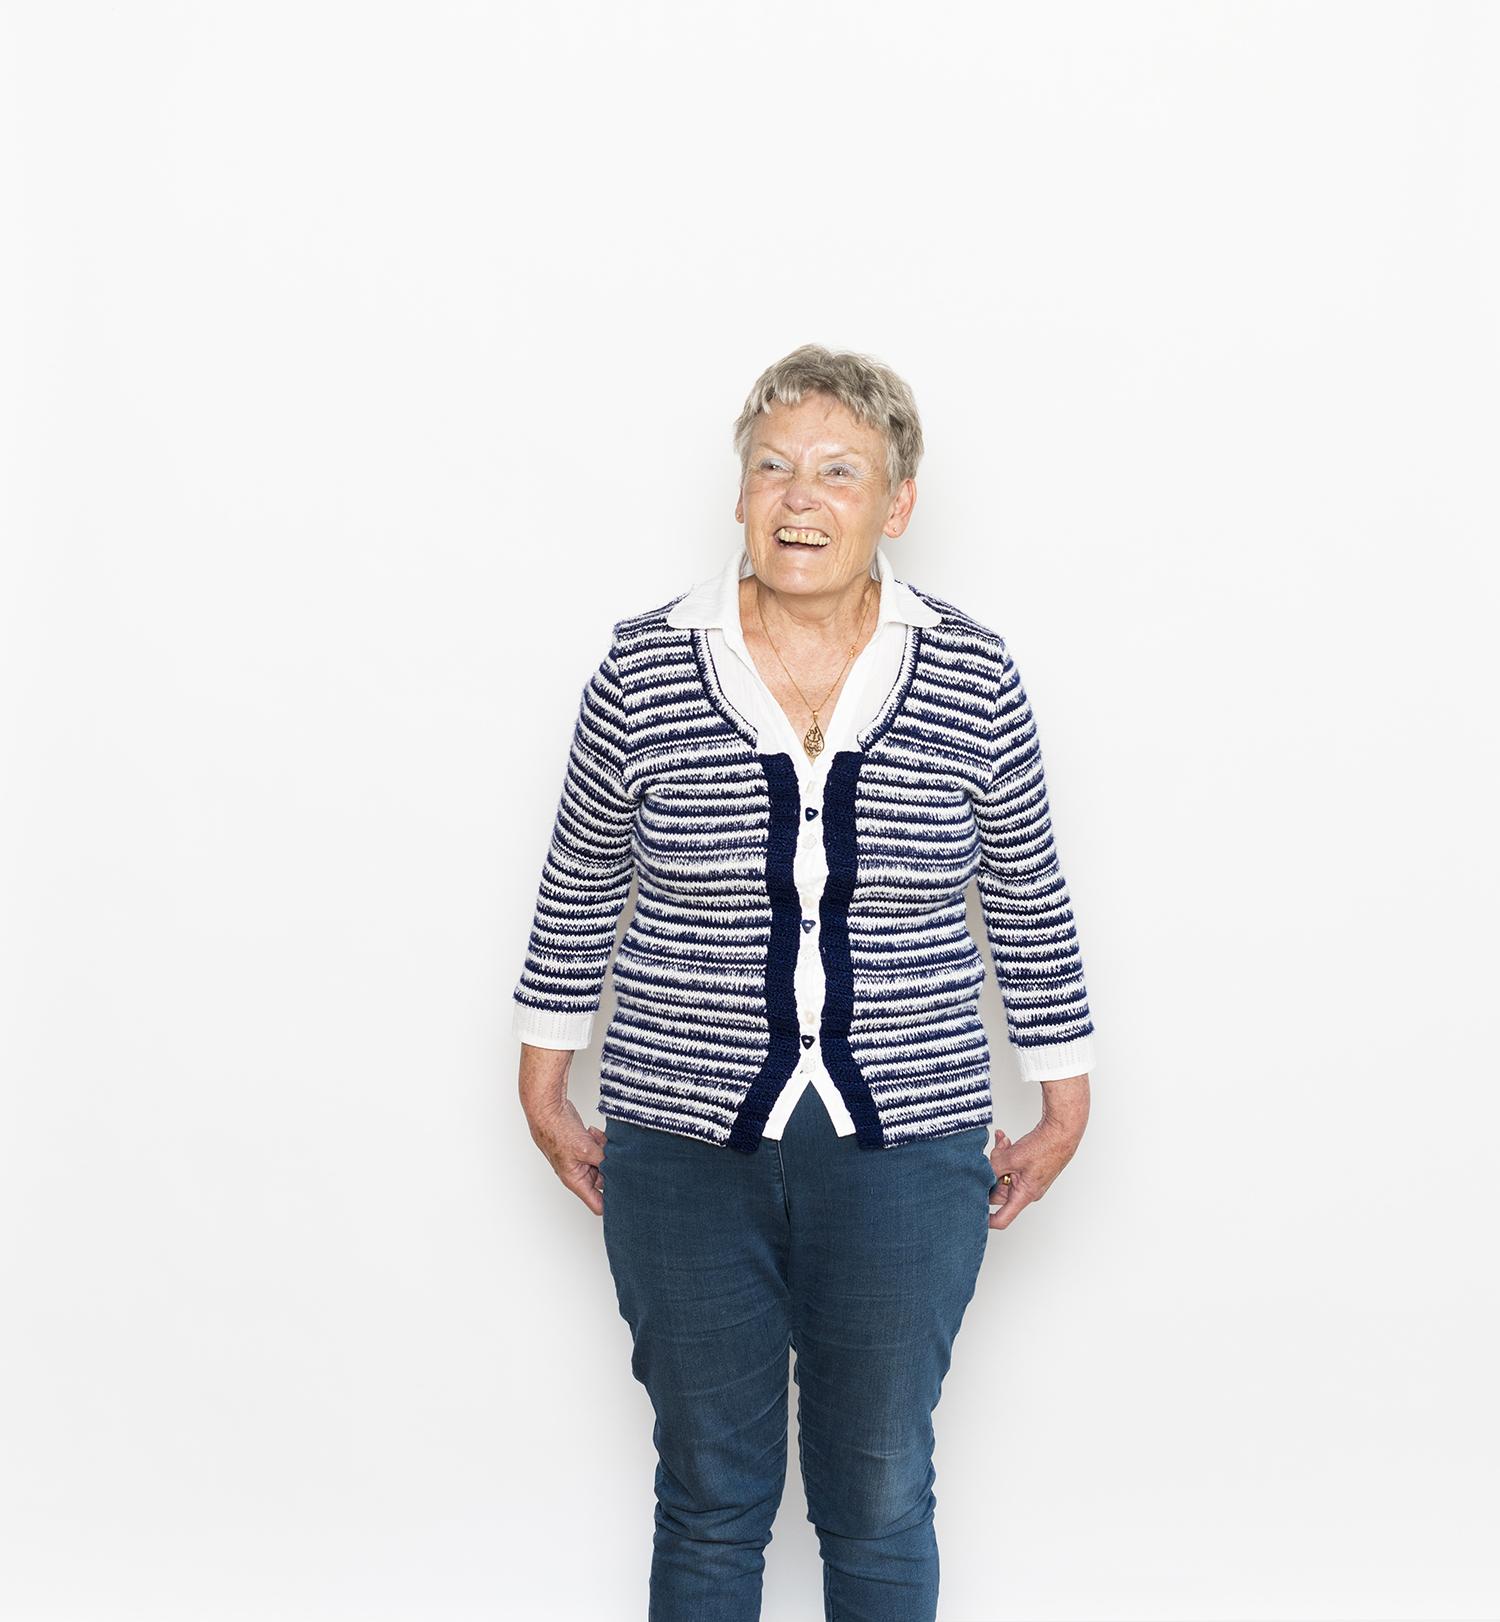 Margaret McCullum. Photo: Steven Pocock/Wellcome Collection